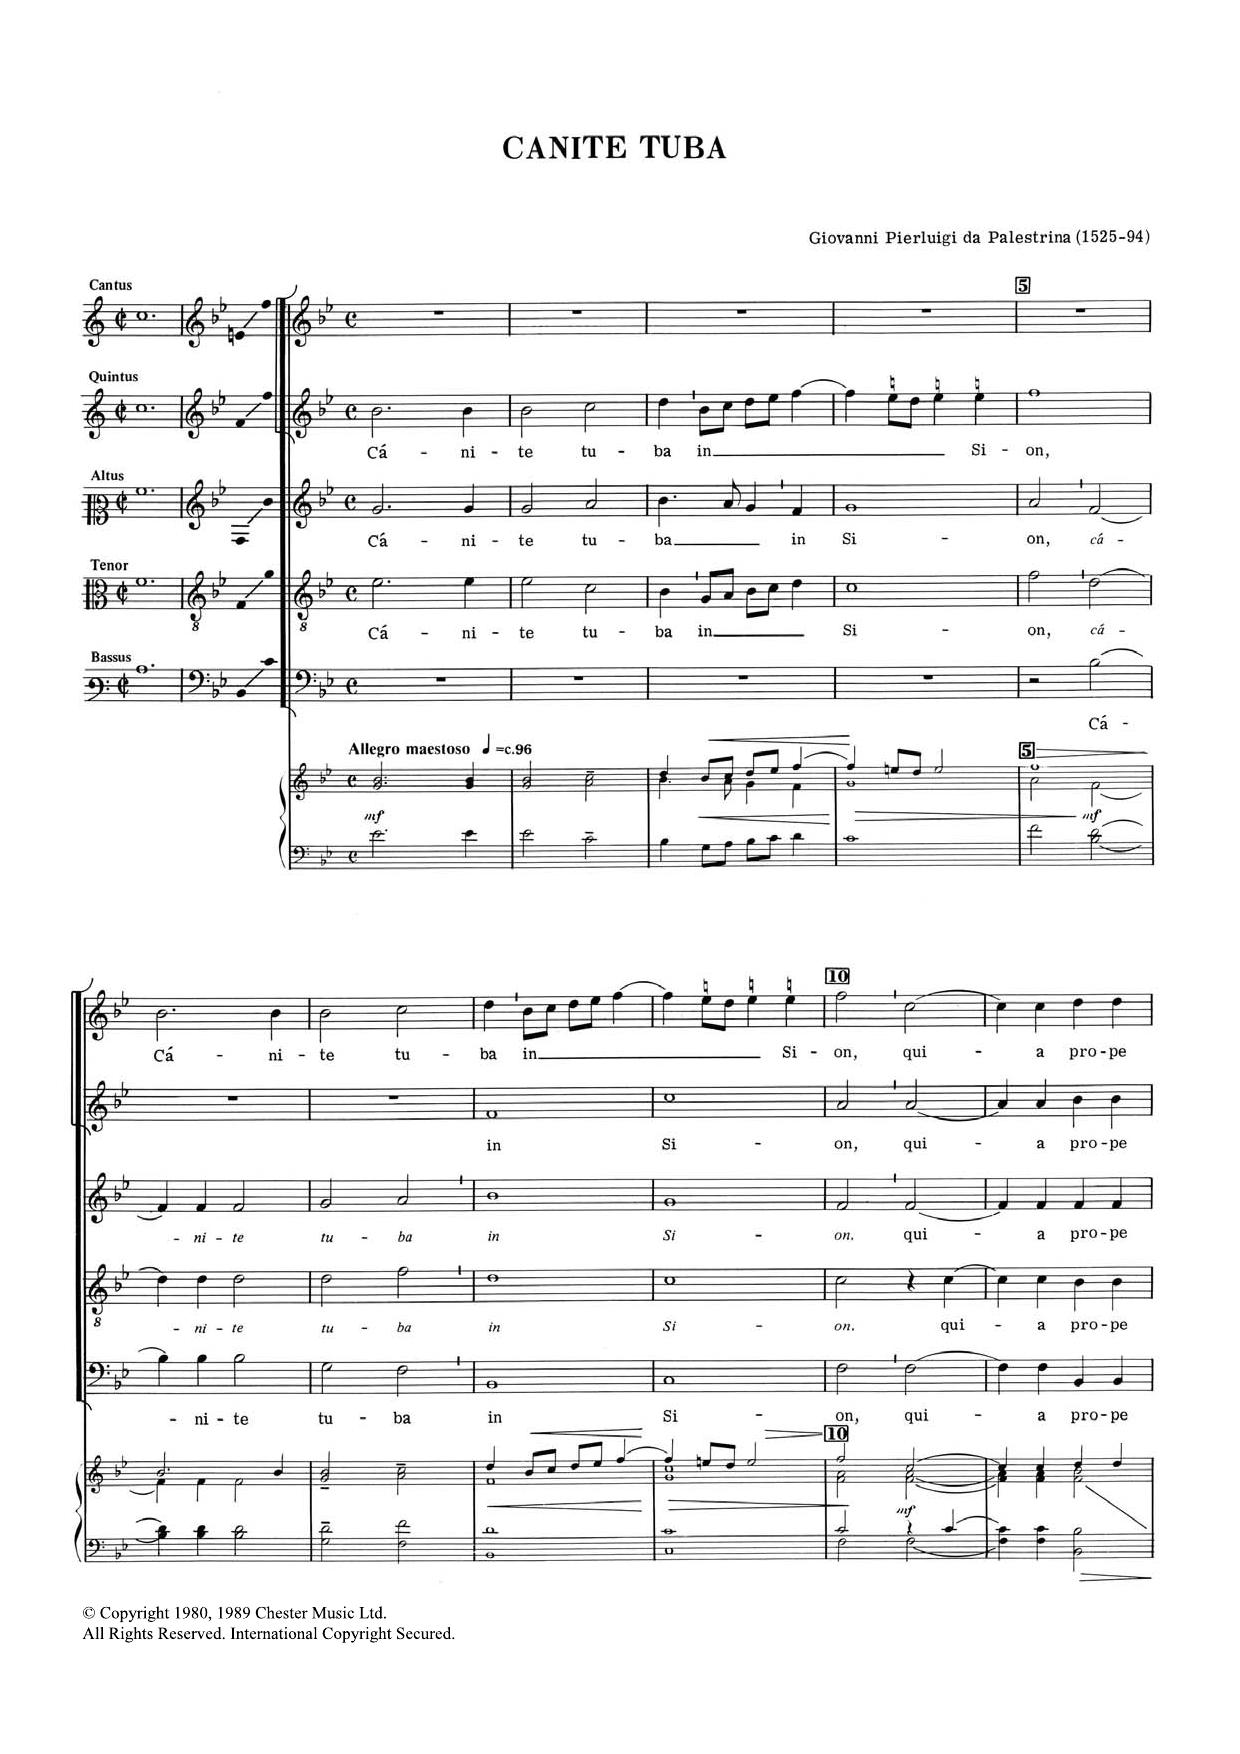 Giovanni Palestrina - Canite Tuba